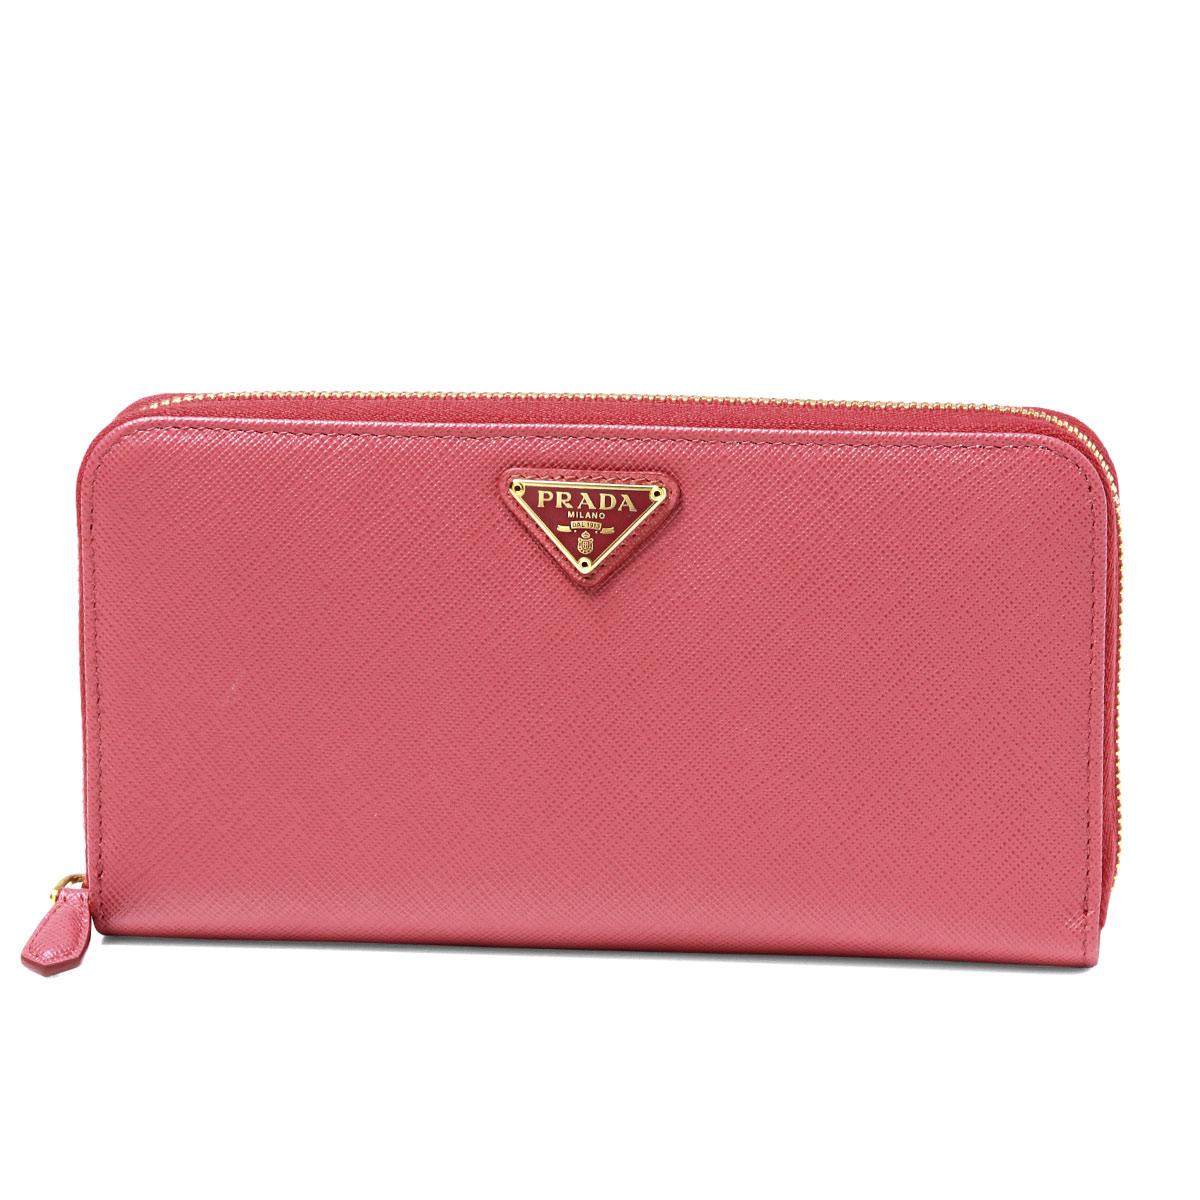 424682d3d72 importshopdouble  PRADA Prada round fastener long wallet PEONIA pink ...